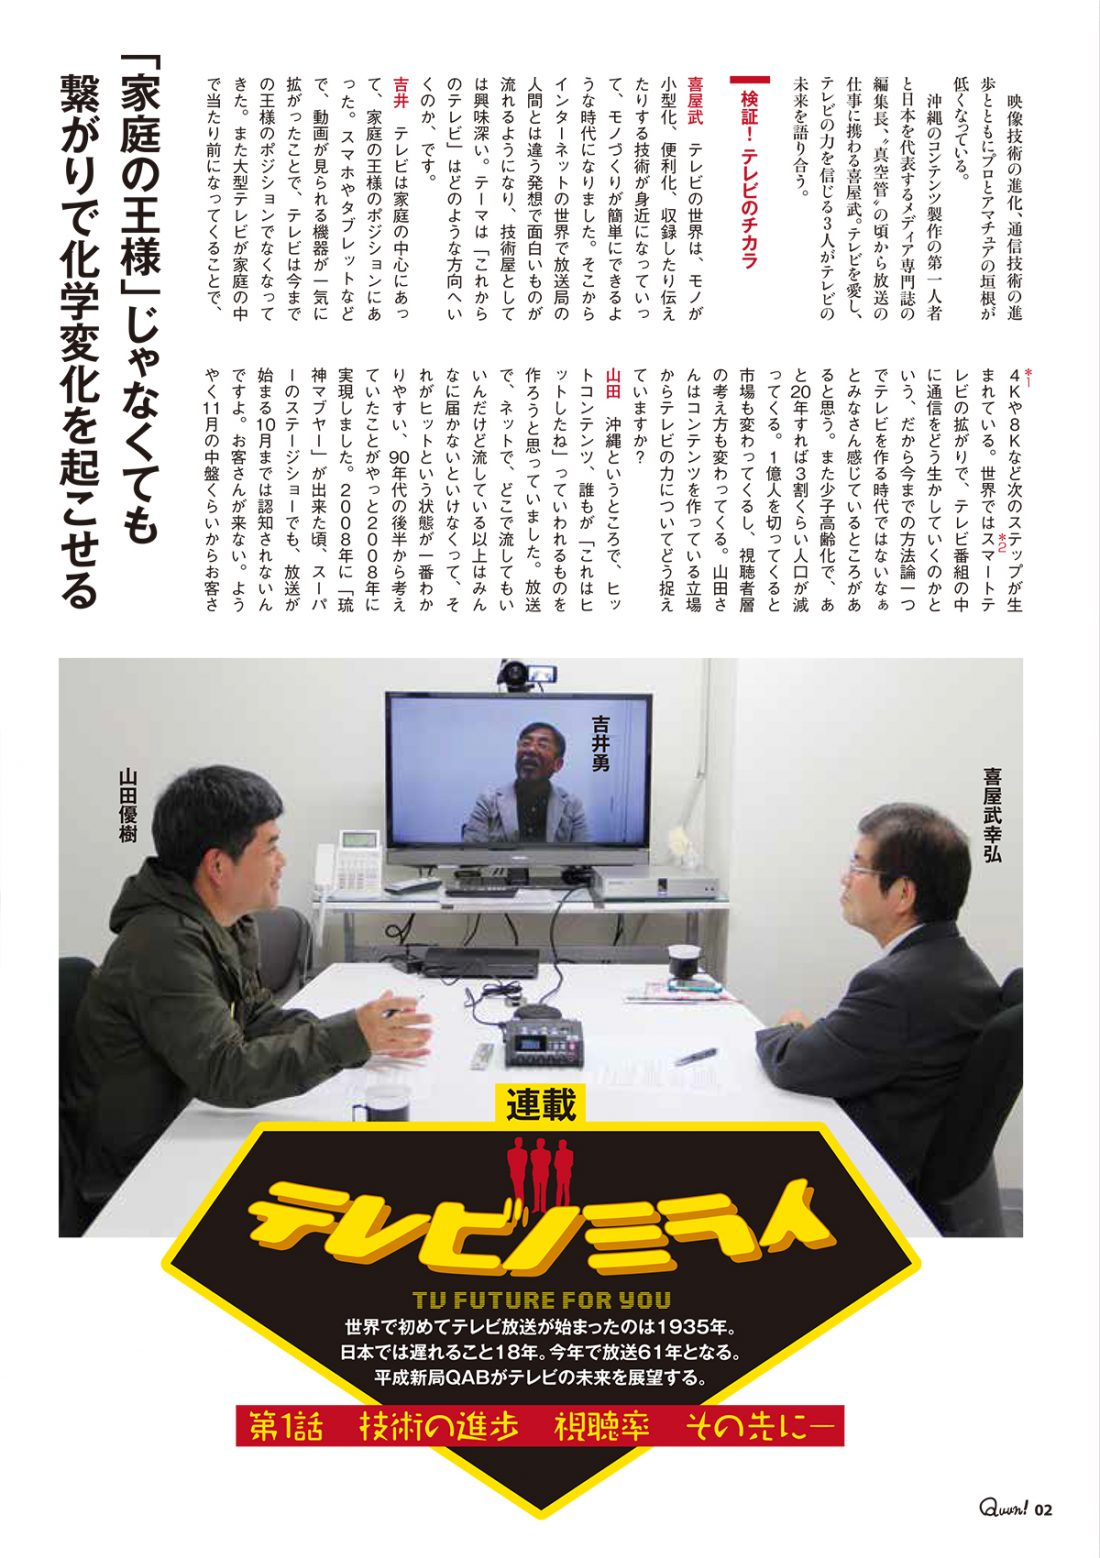 http://www.qab.co.jp/qgoro/wp-content/uploads/quun_0104-1100x1558.jpg